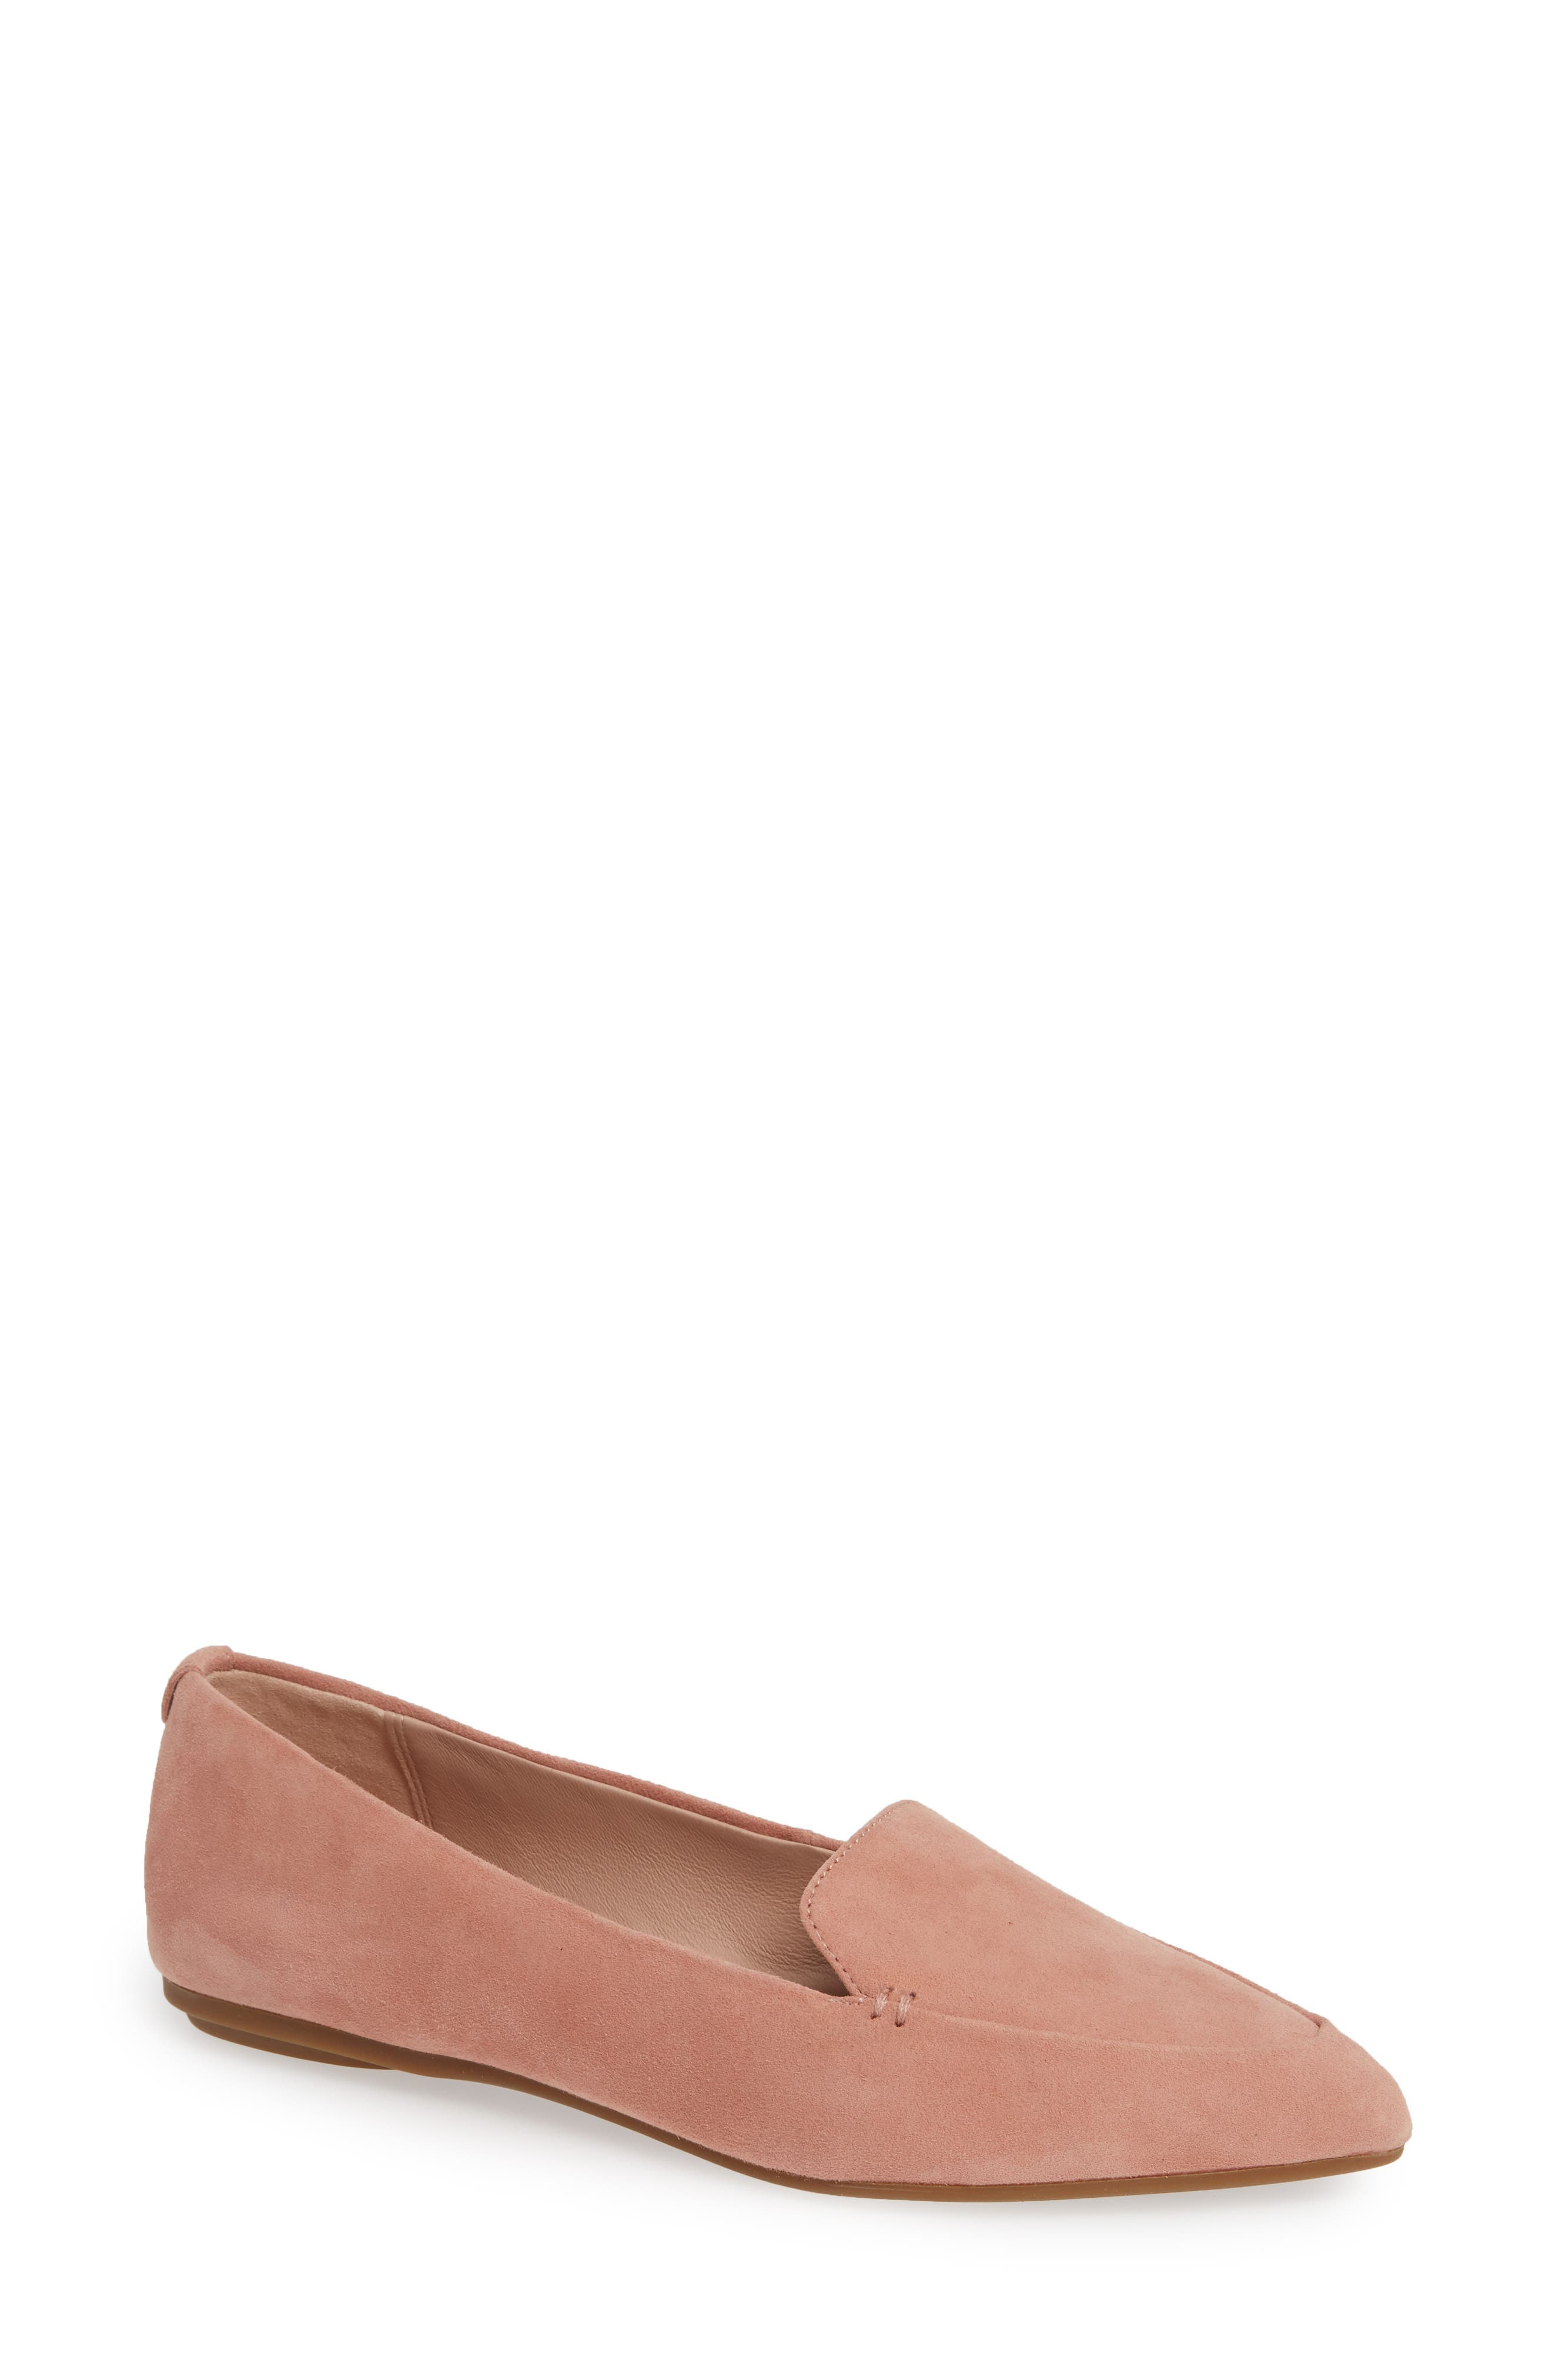 Women's Taryn Rose Comfortable Shoes